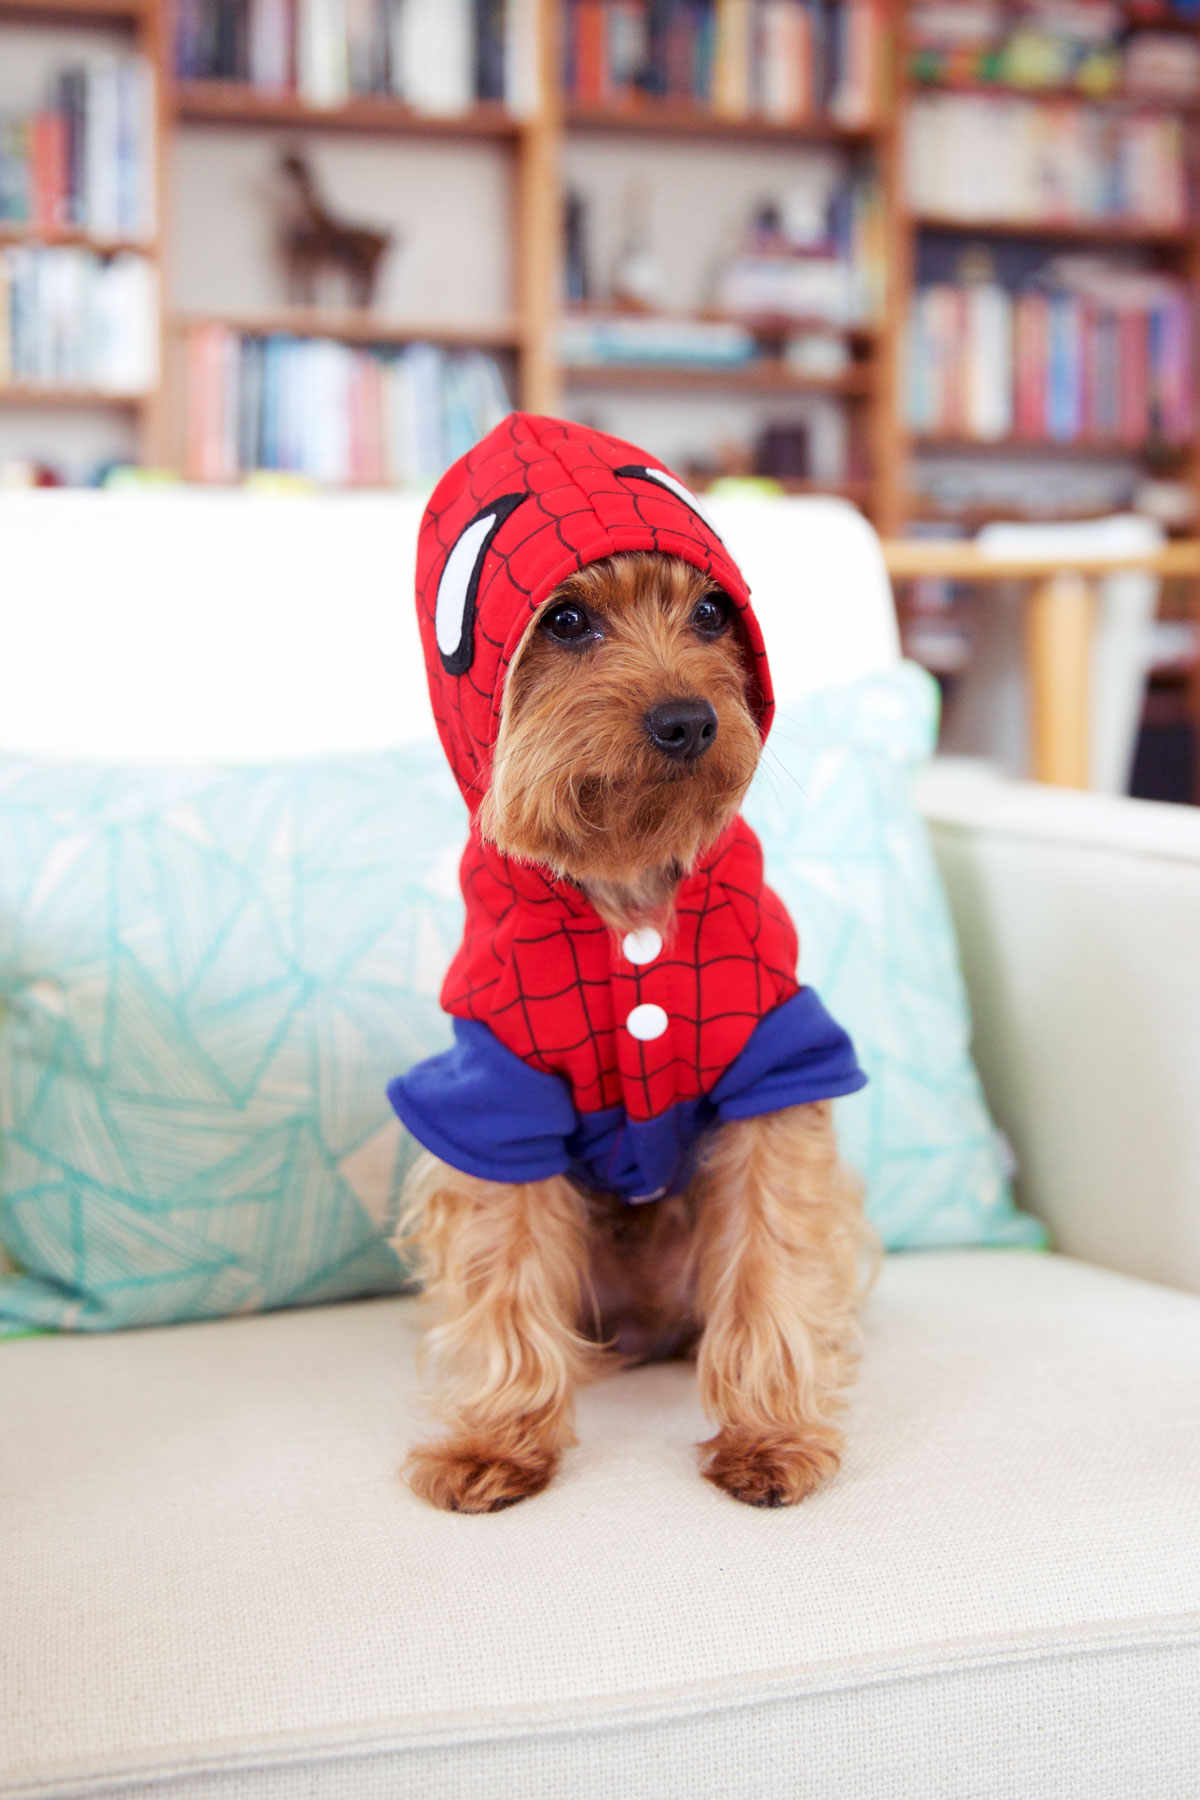 Spider Hood